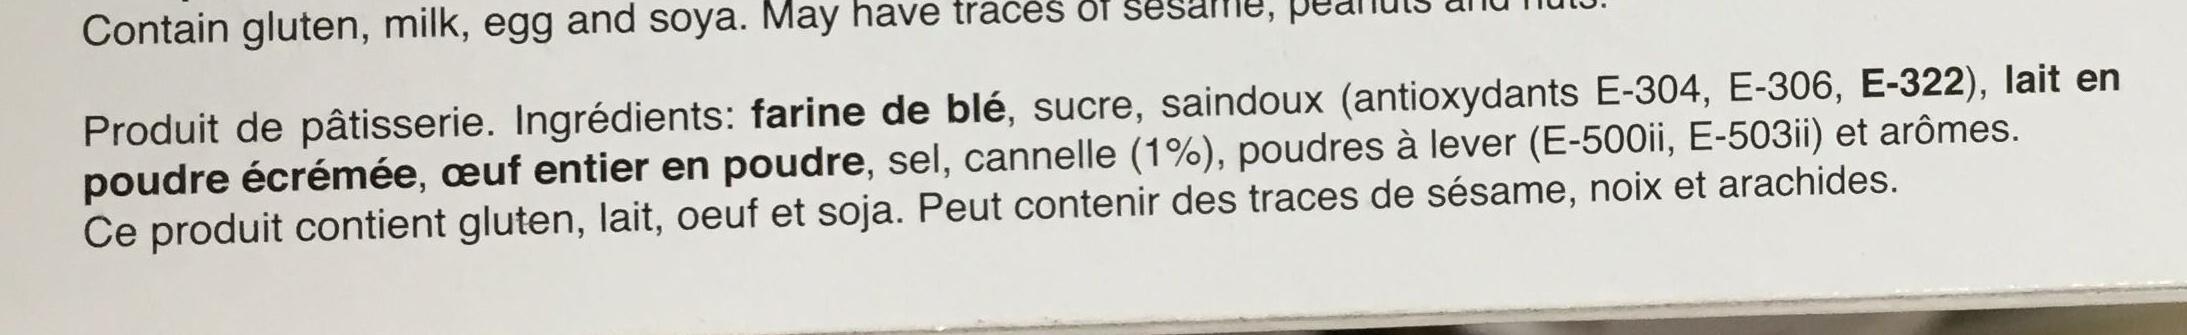 Biscuits de canela - Ingredients - fr